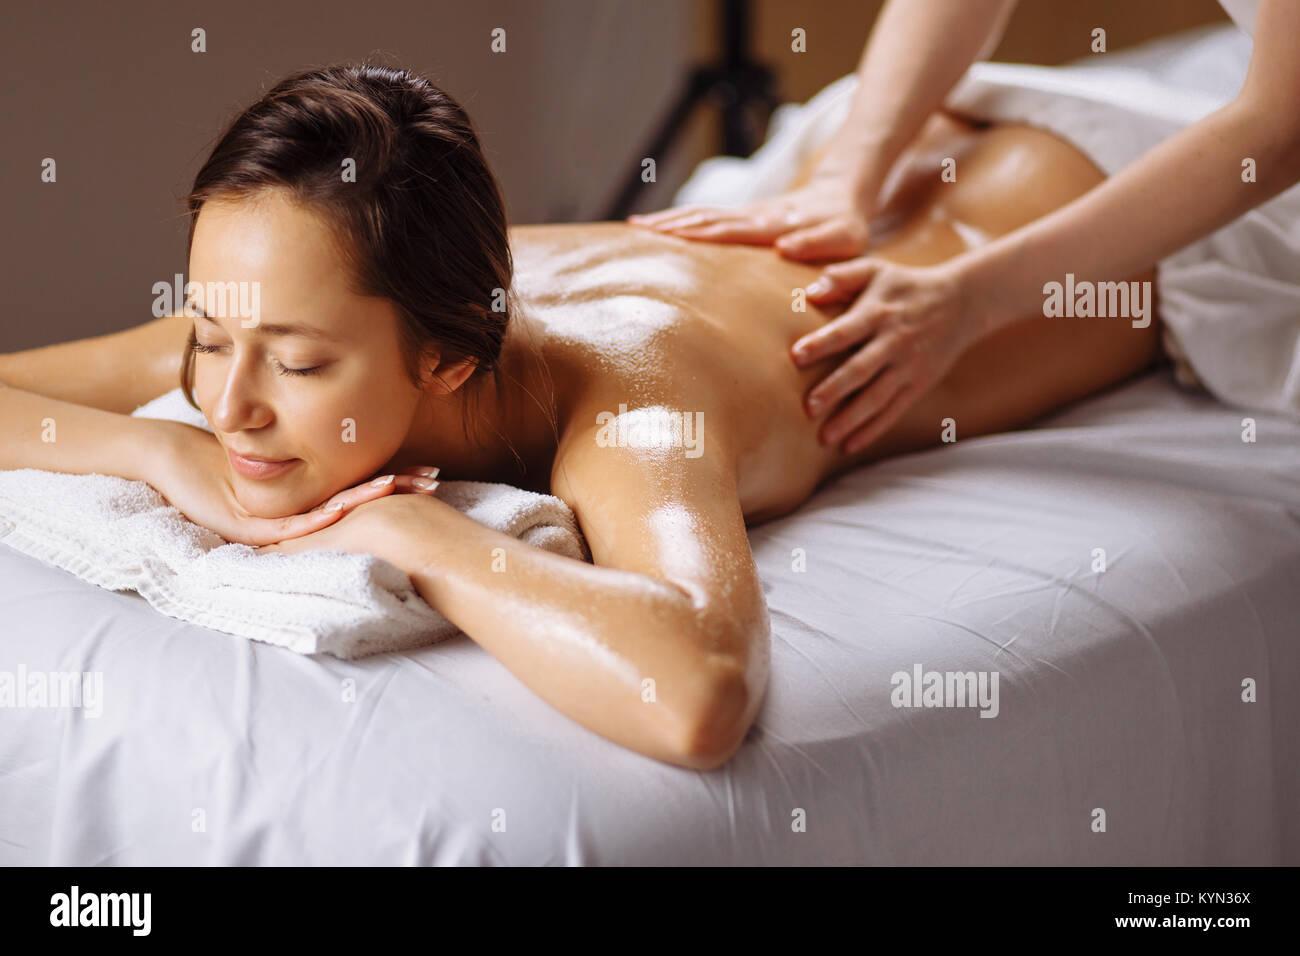 girls having a massage